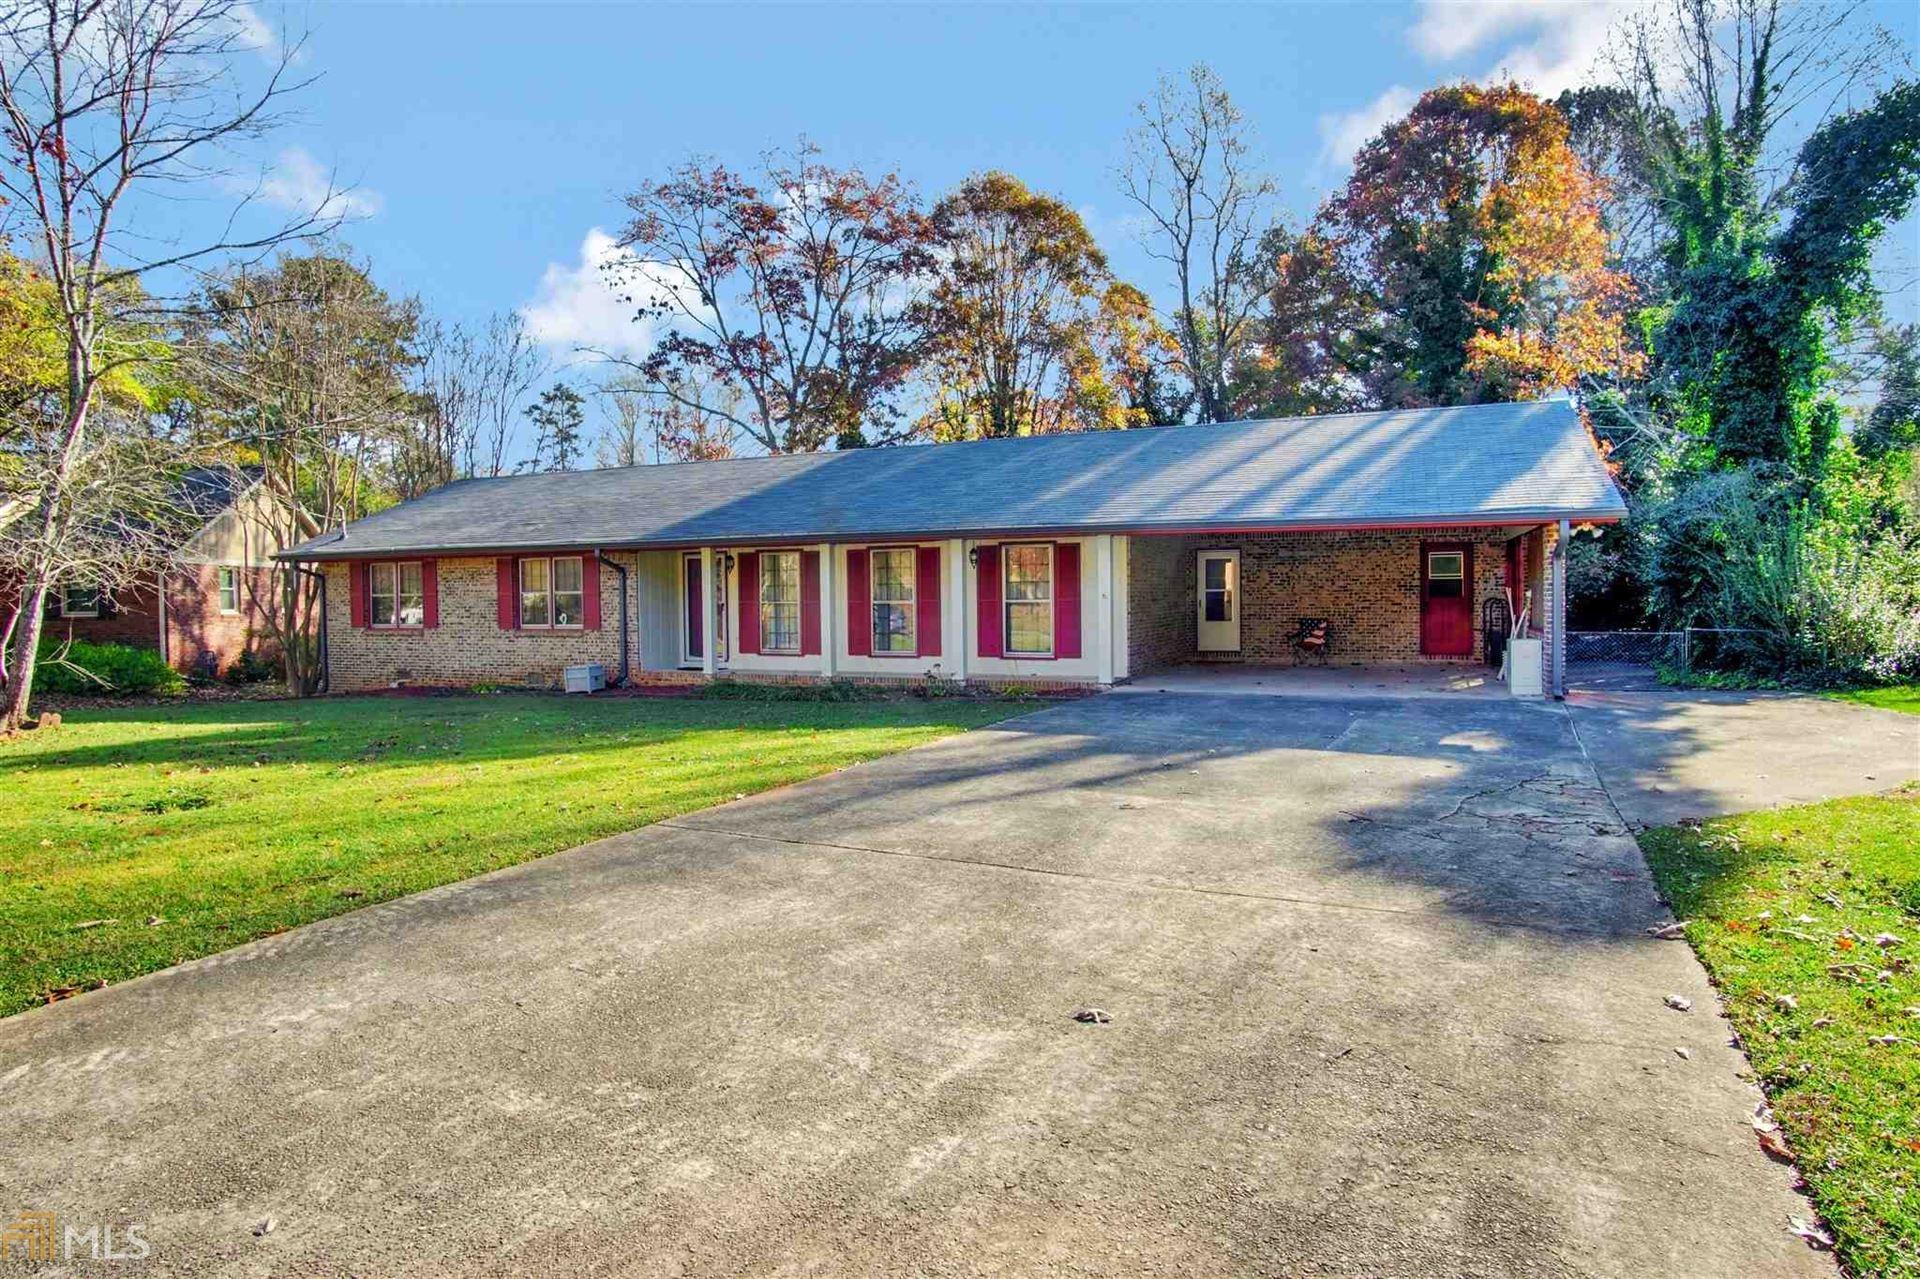 722 Rollingwood Dr, Stone Mountain, GA 30087 - MLS#: 8894425